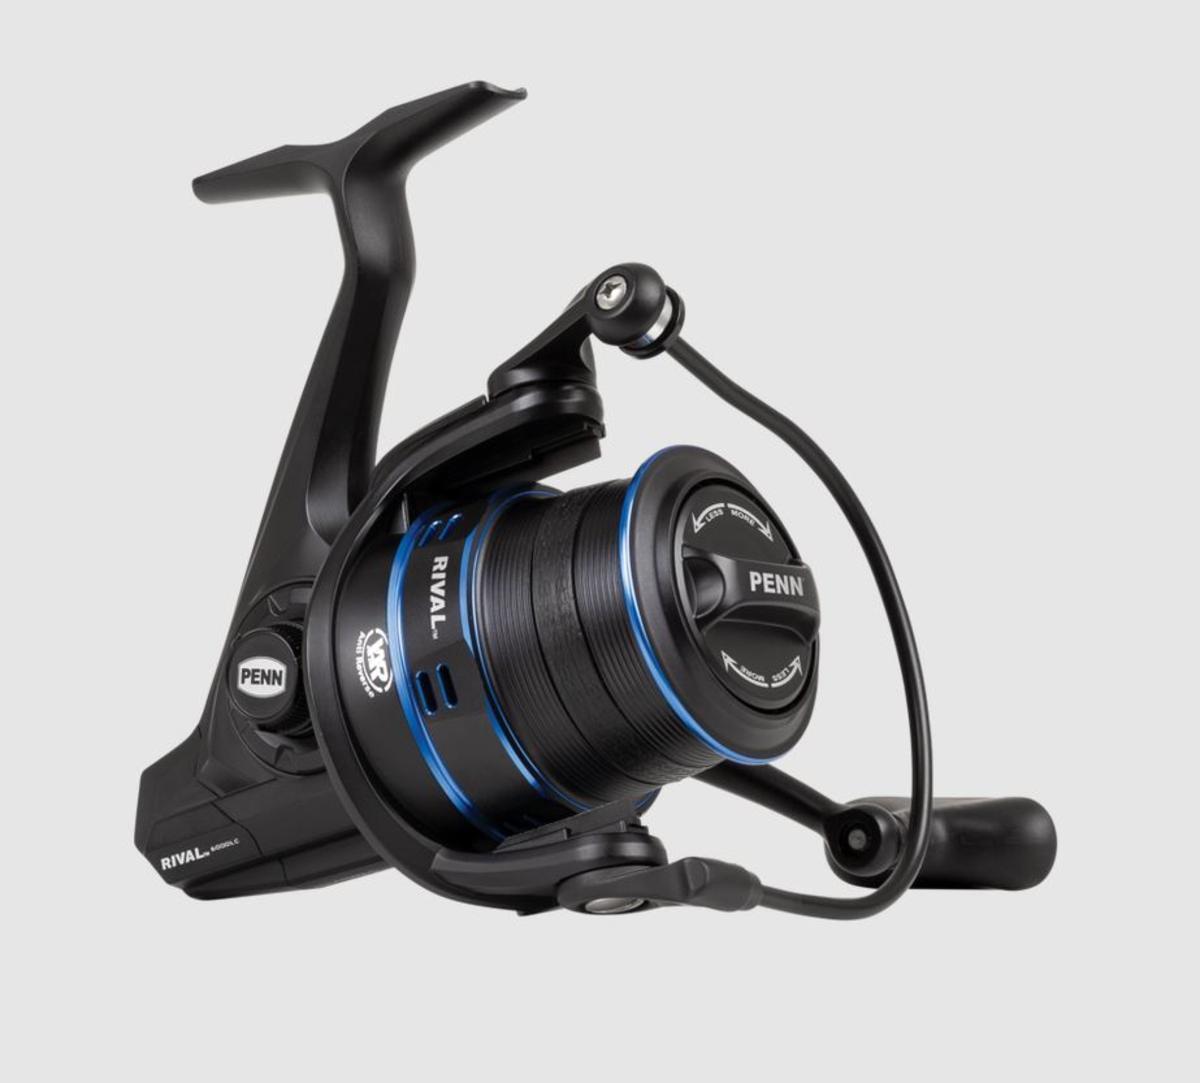 New PENN Rival 7000 Longcast Blue - Surf Pack / Fixed Spool Reel - Case & Spools